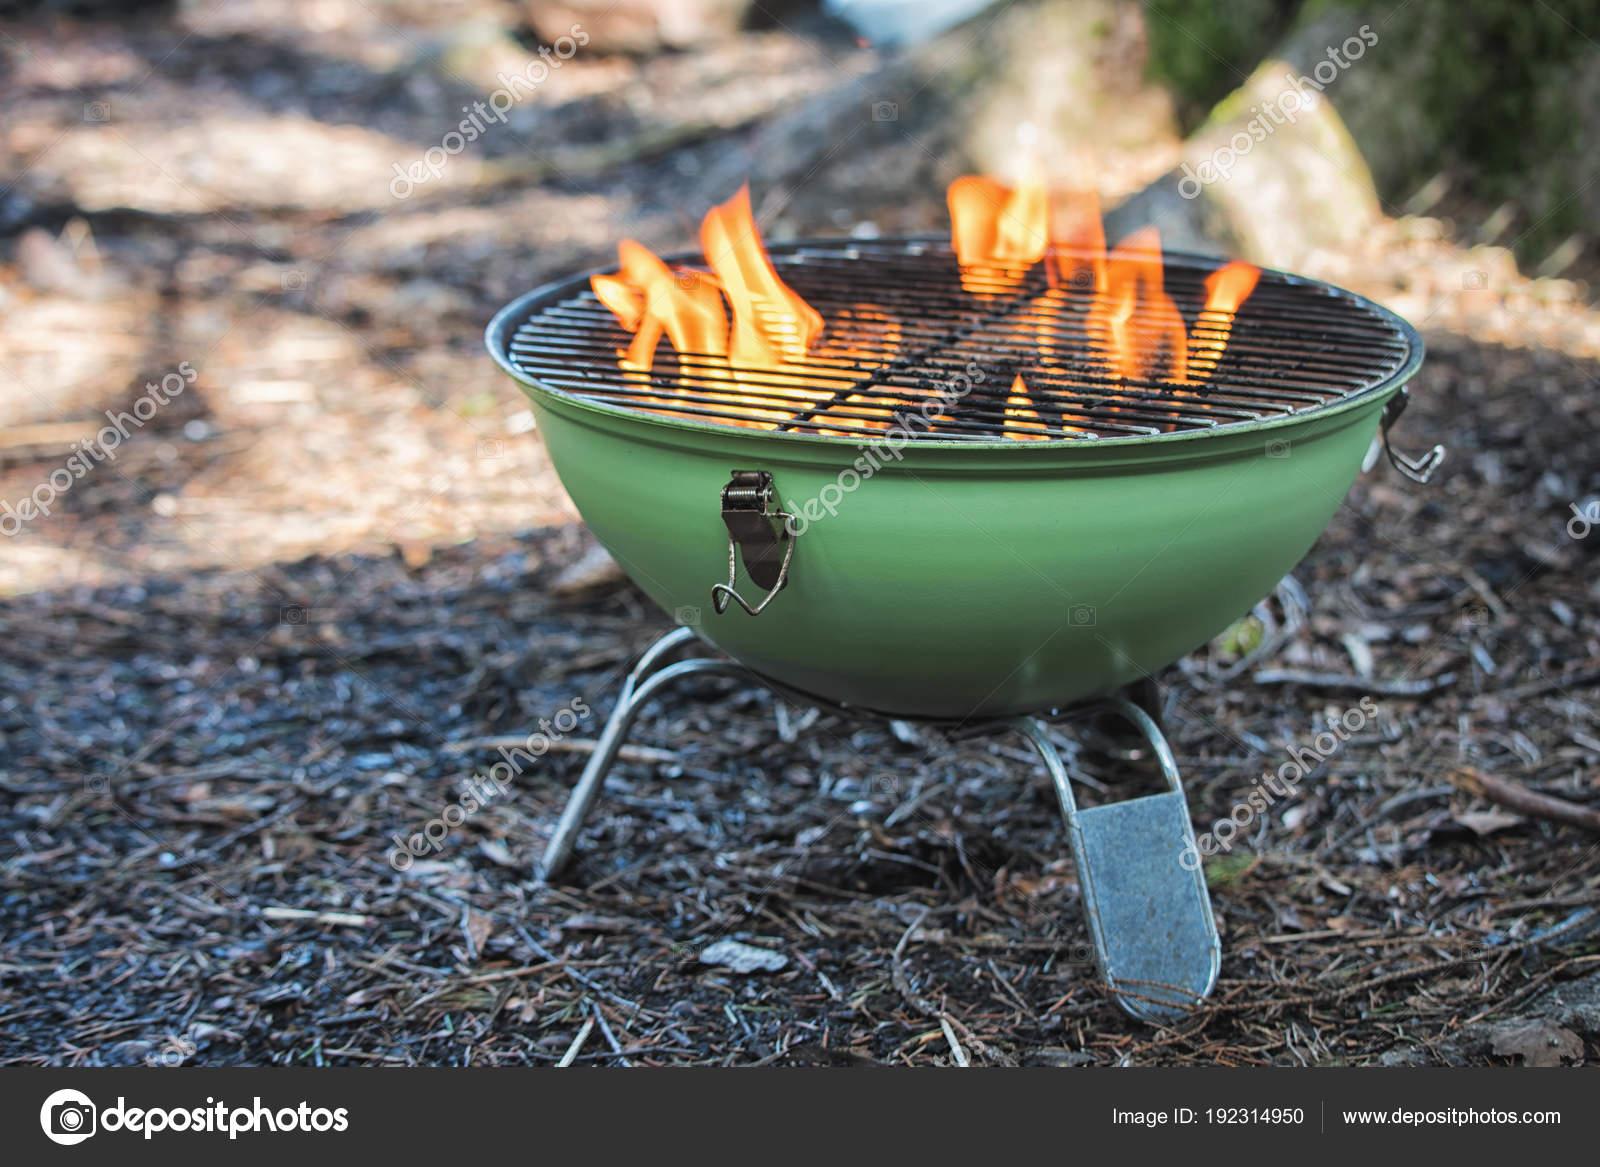 grily horké pic